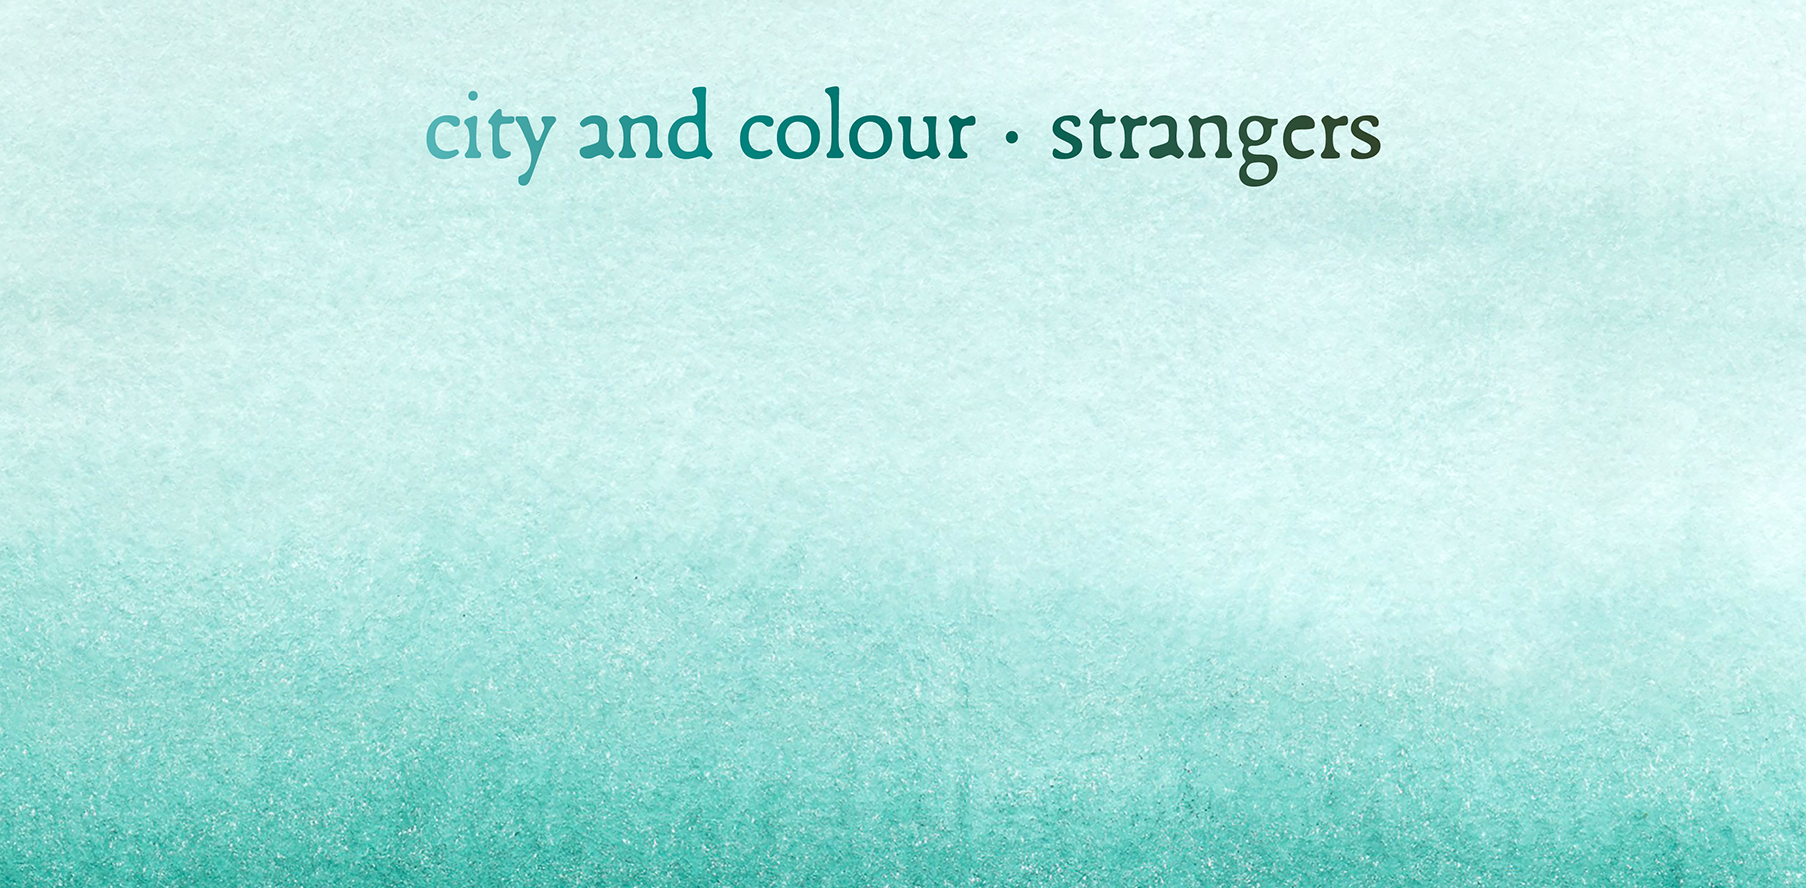 cc-strangers-silo